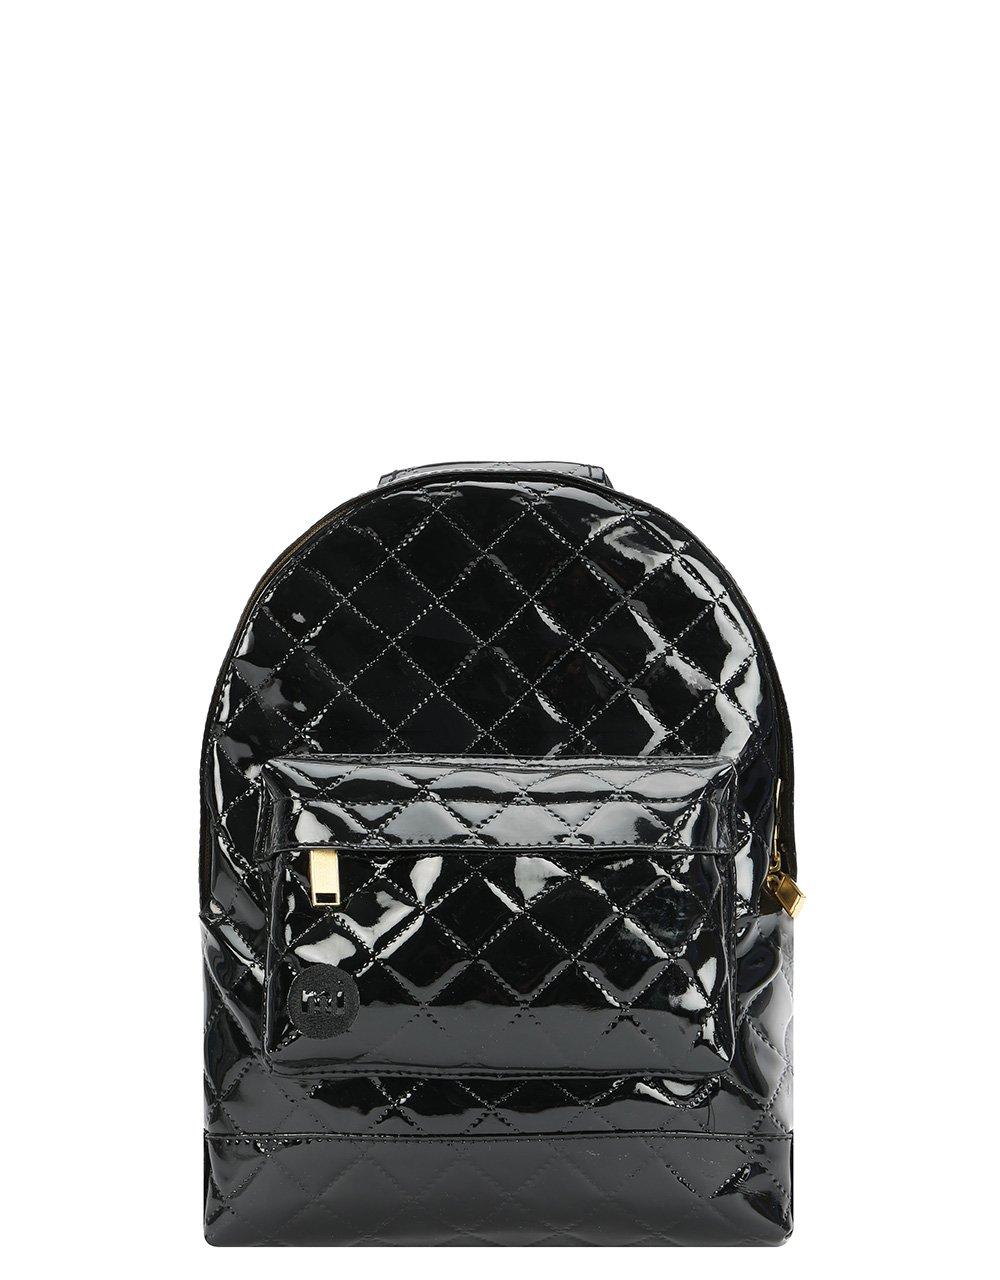 Mi-Pac - Mini Backpack - Patent Quilt - Black (740416-S65)